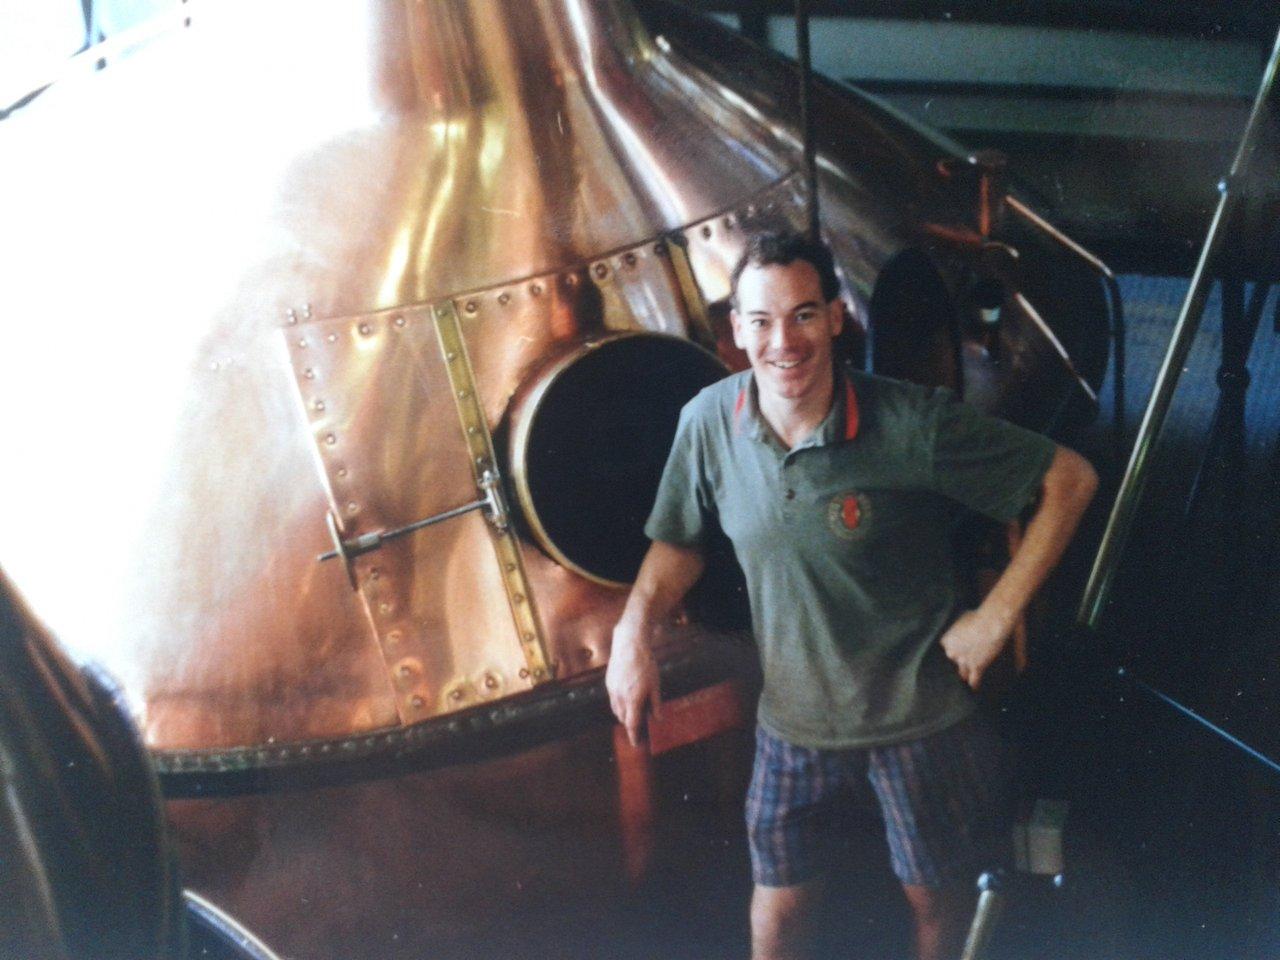 Ken Duncan at Redback Brewery